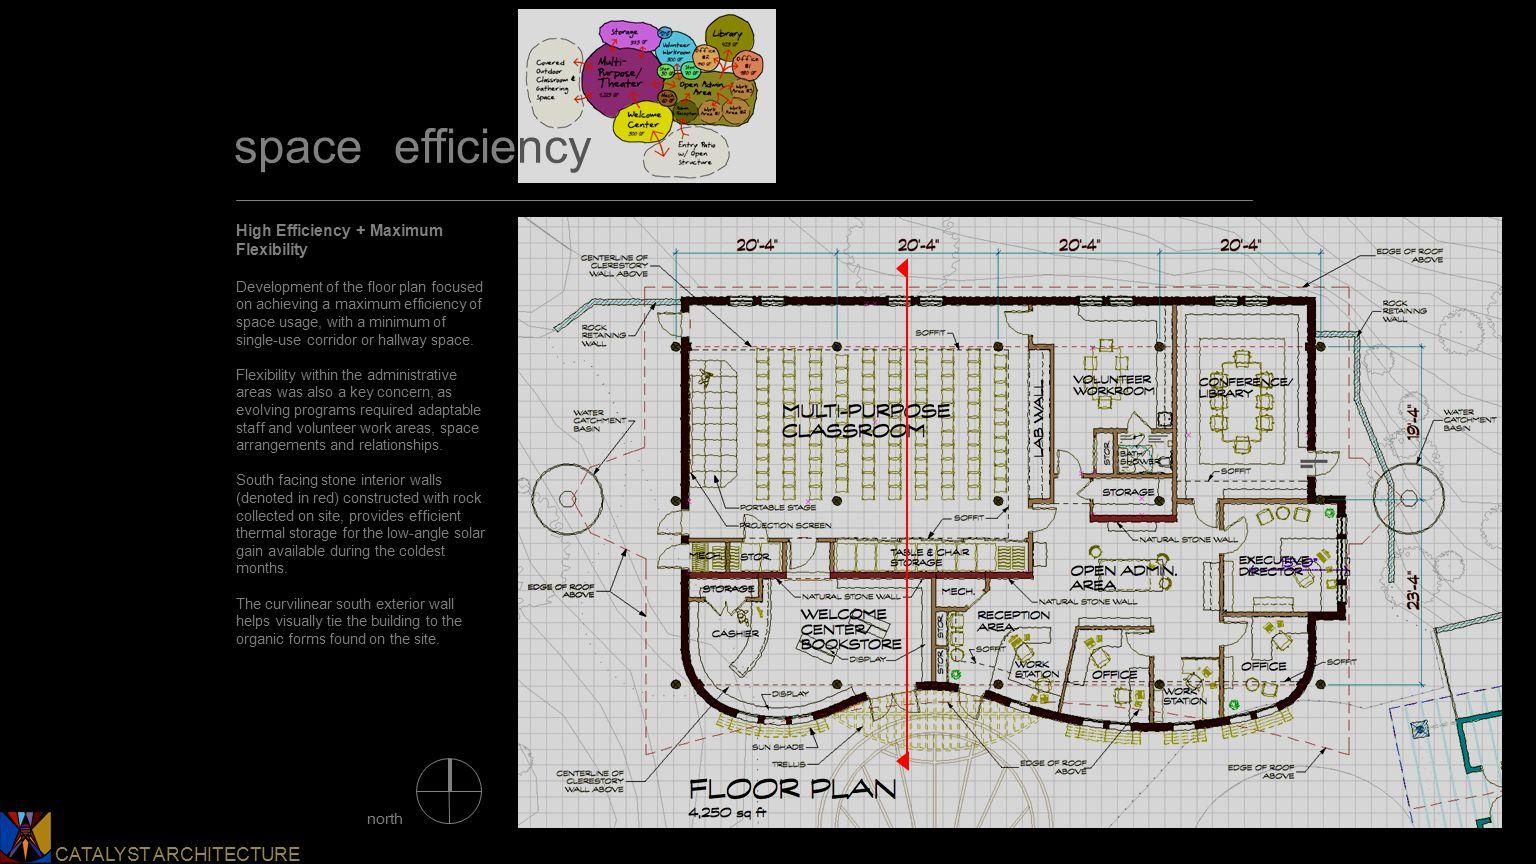 Catalyst Architecture CATALYST ARCHITECTURE space – efficiency High Efficiency + Maximum Flexibility Development of the floor plan focused on achieving a maximum efficiency of space usage, with a minimum of single-use corridor or hallway space.